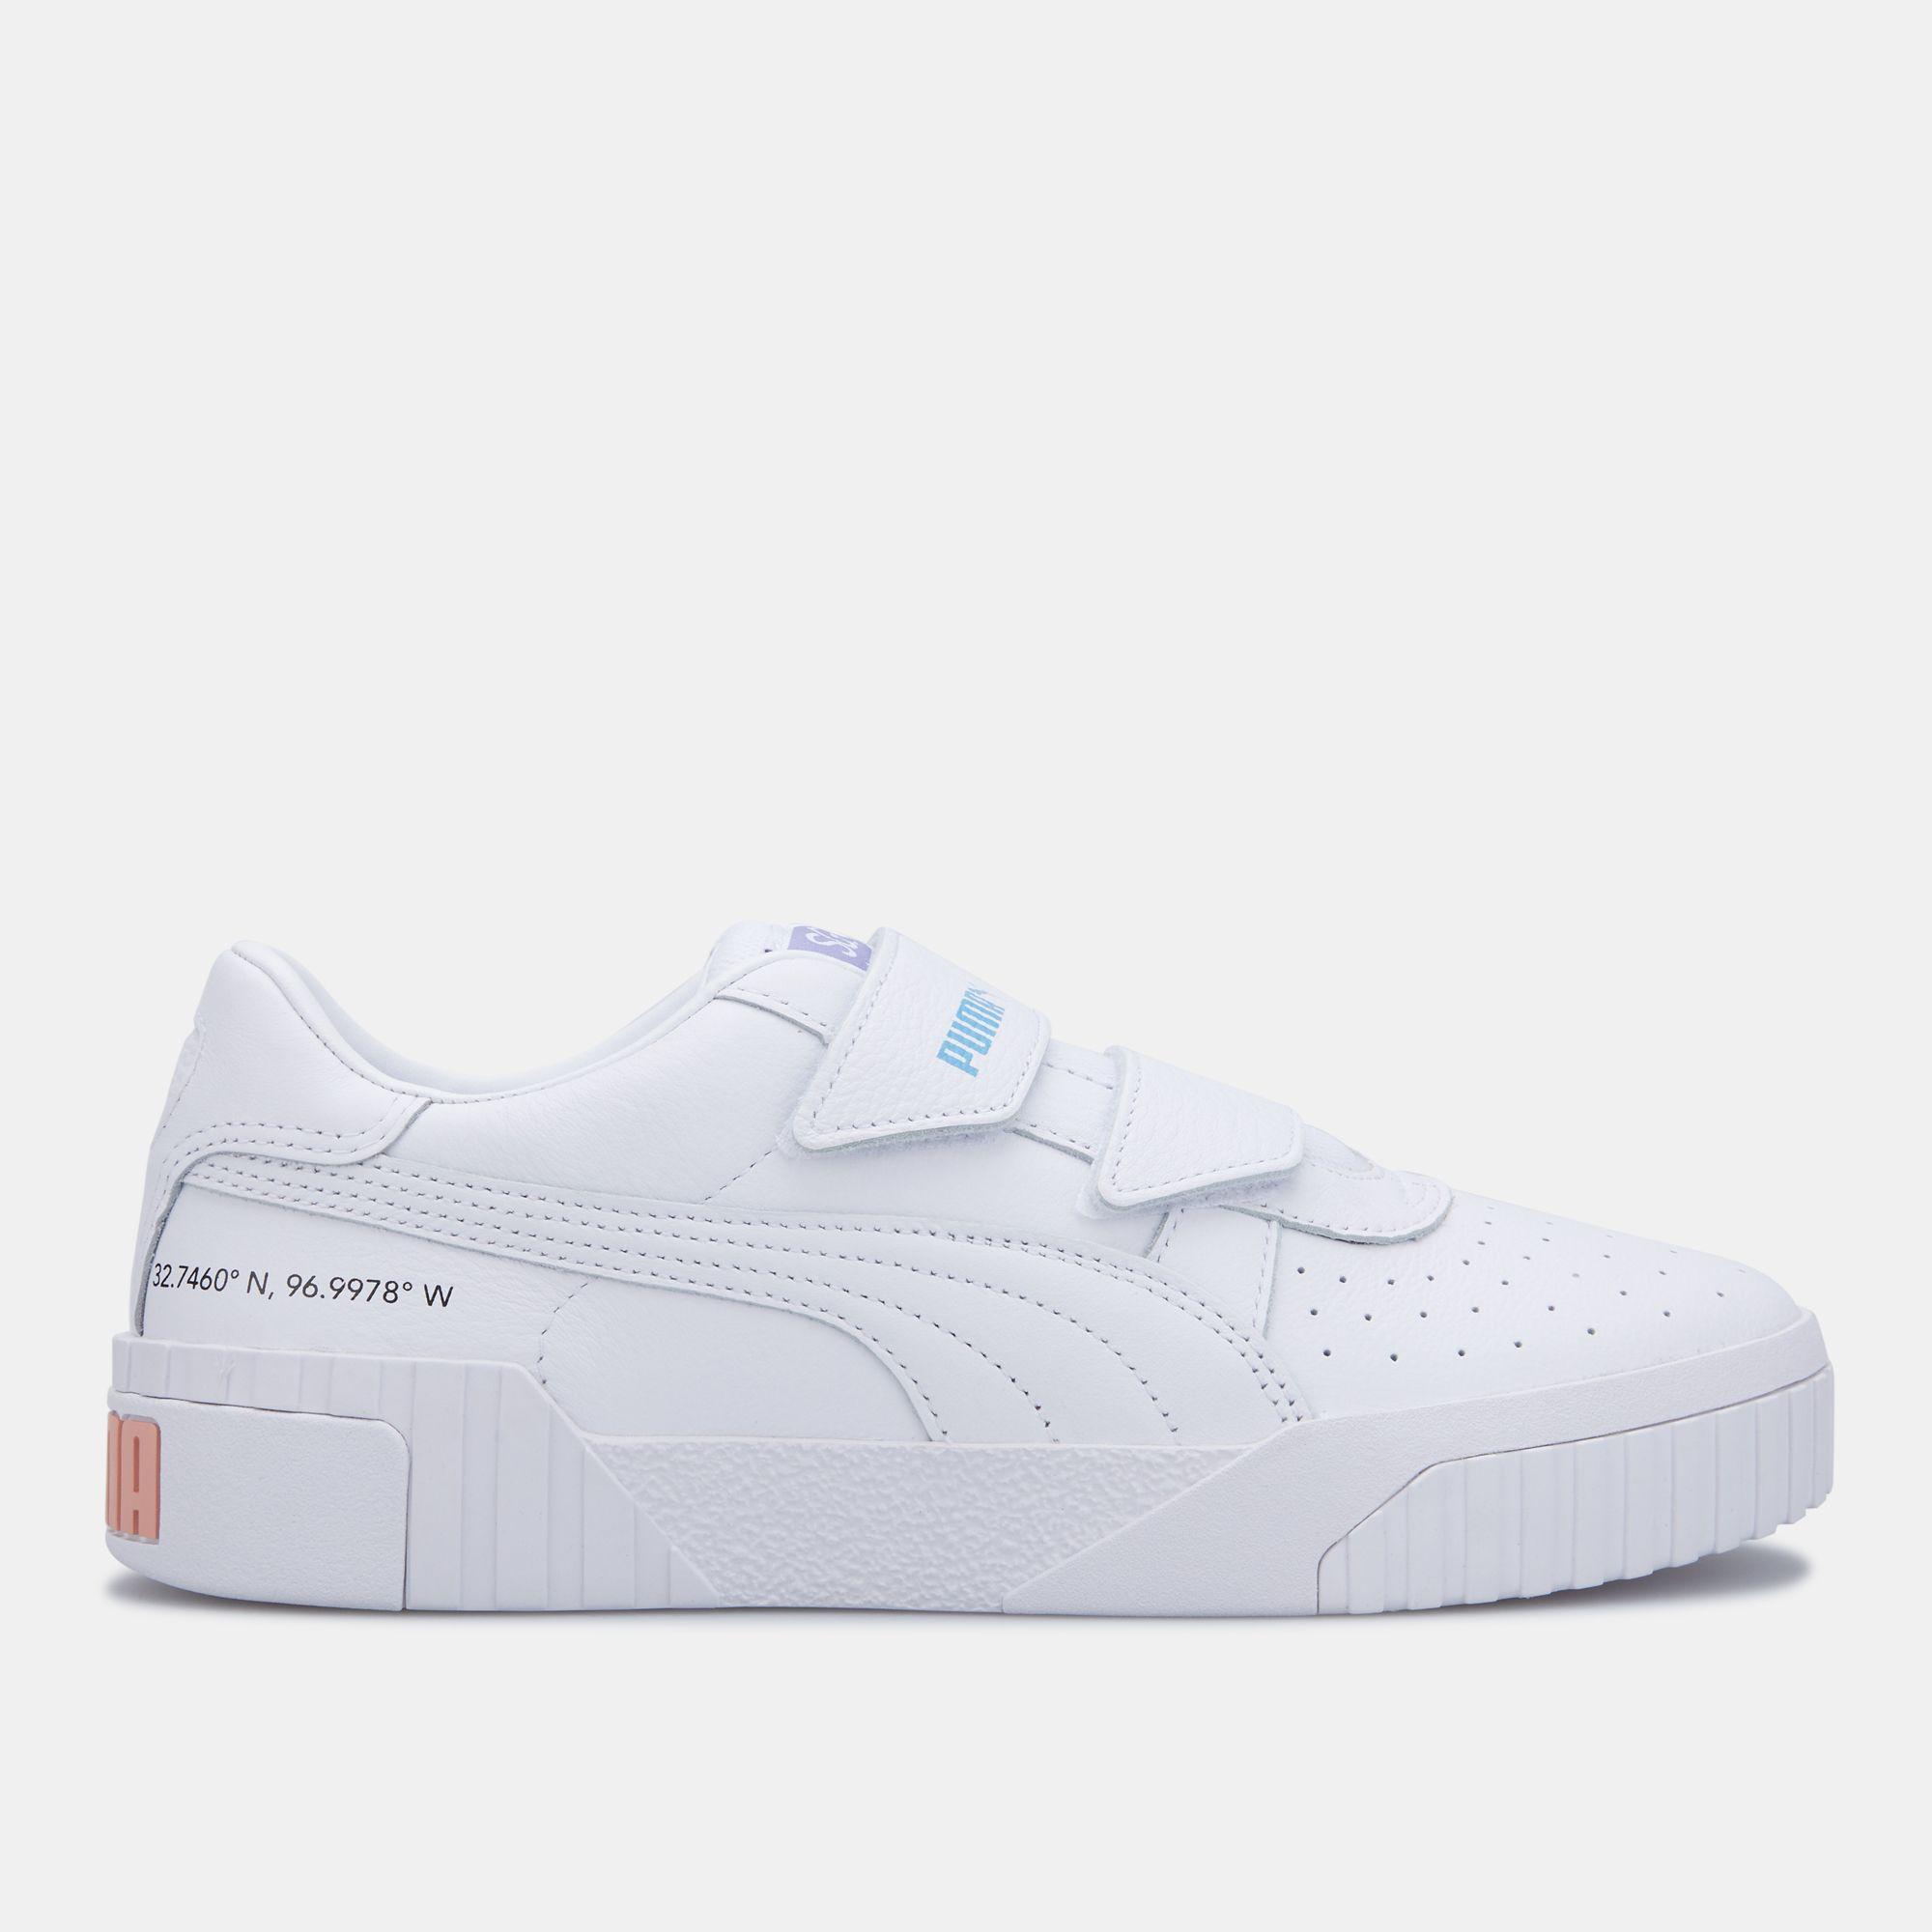 white puma velcro shoes Online Shopping